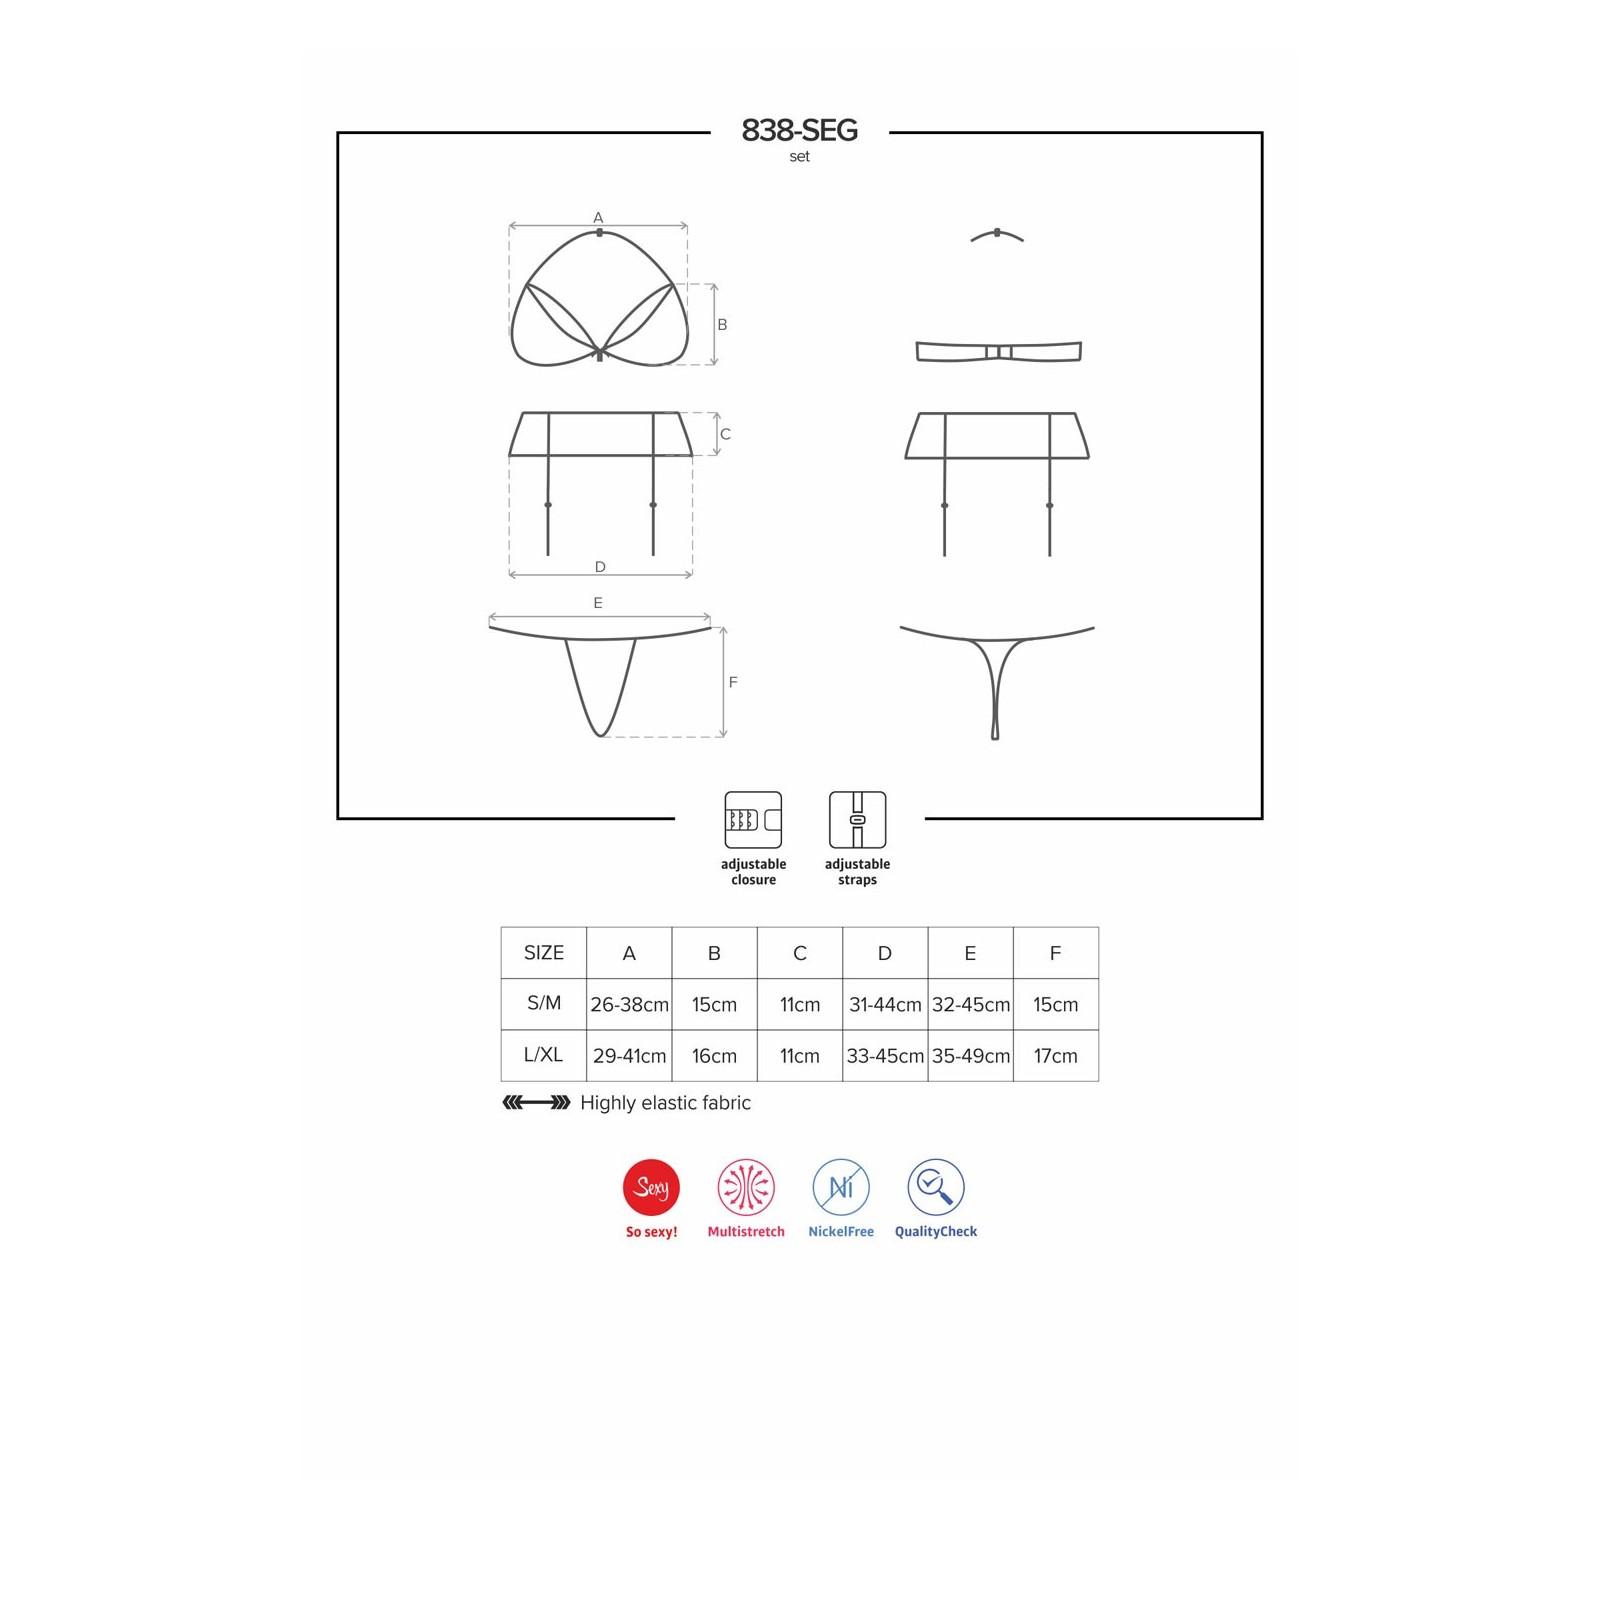 838-SEG-3 Set rot - 7 - Vorschaubild